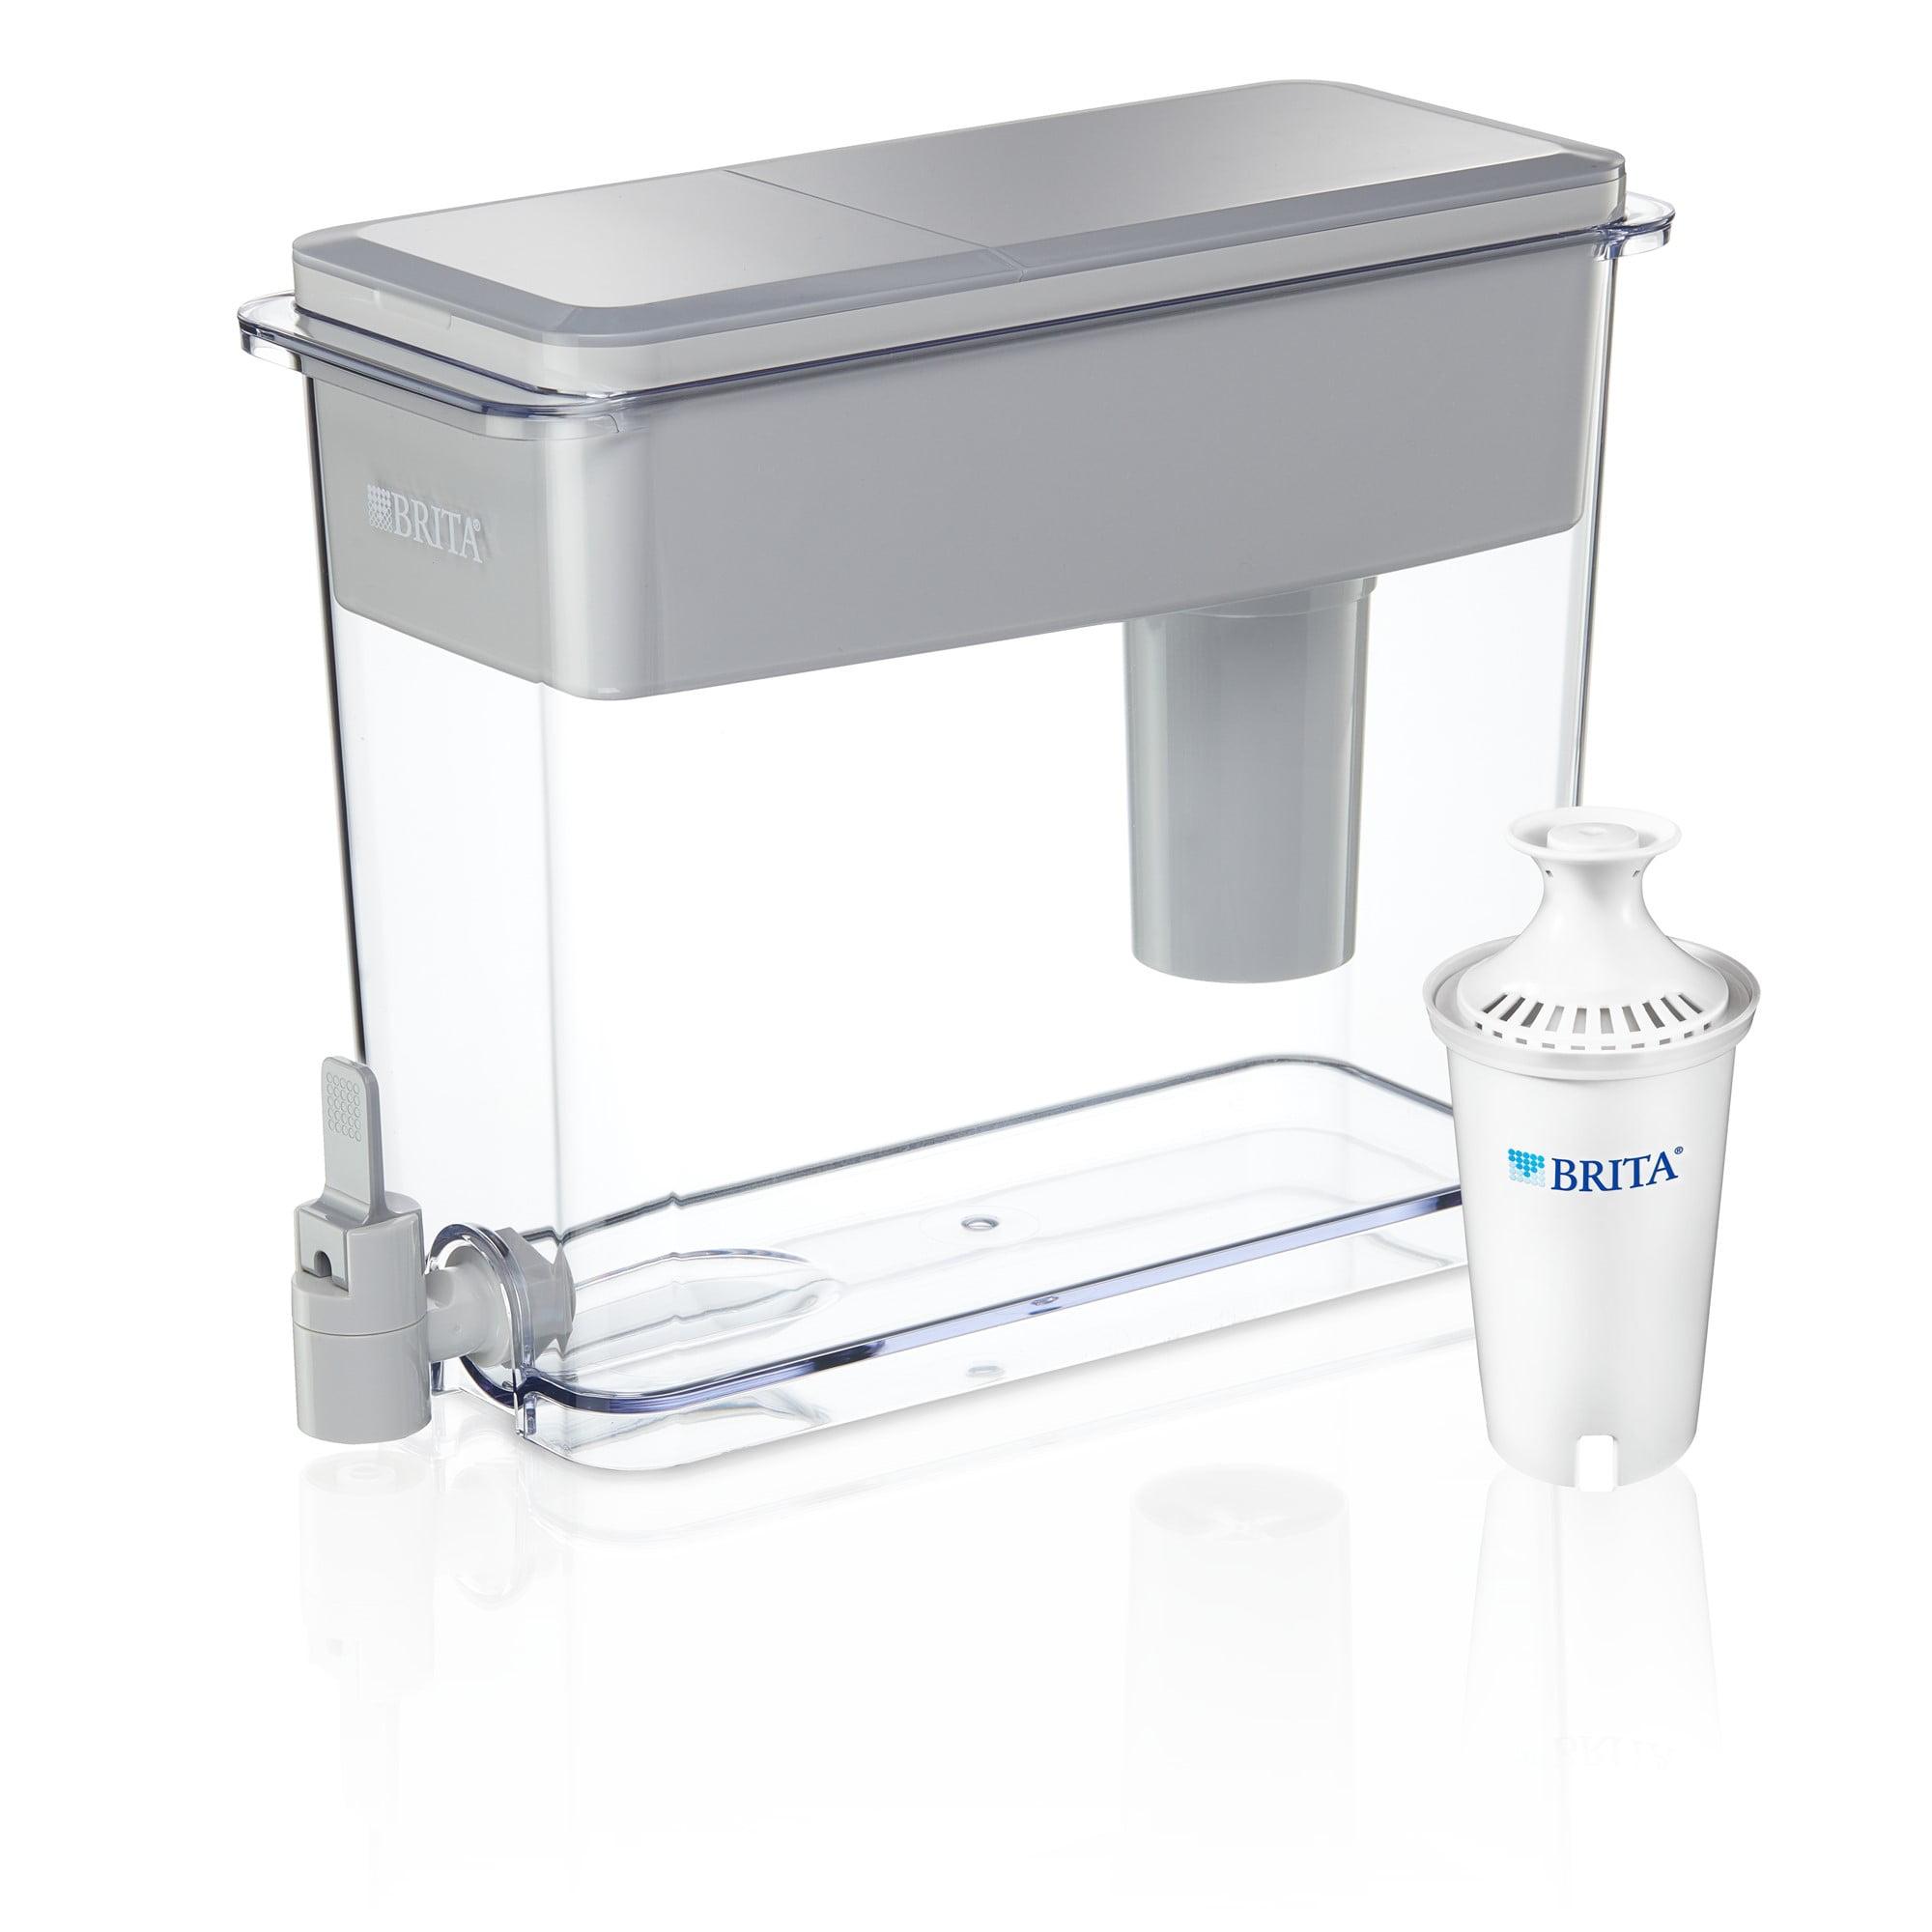 brita ultramax dispenser how to clean